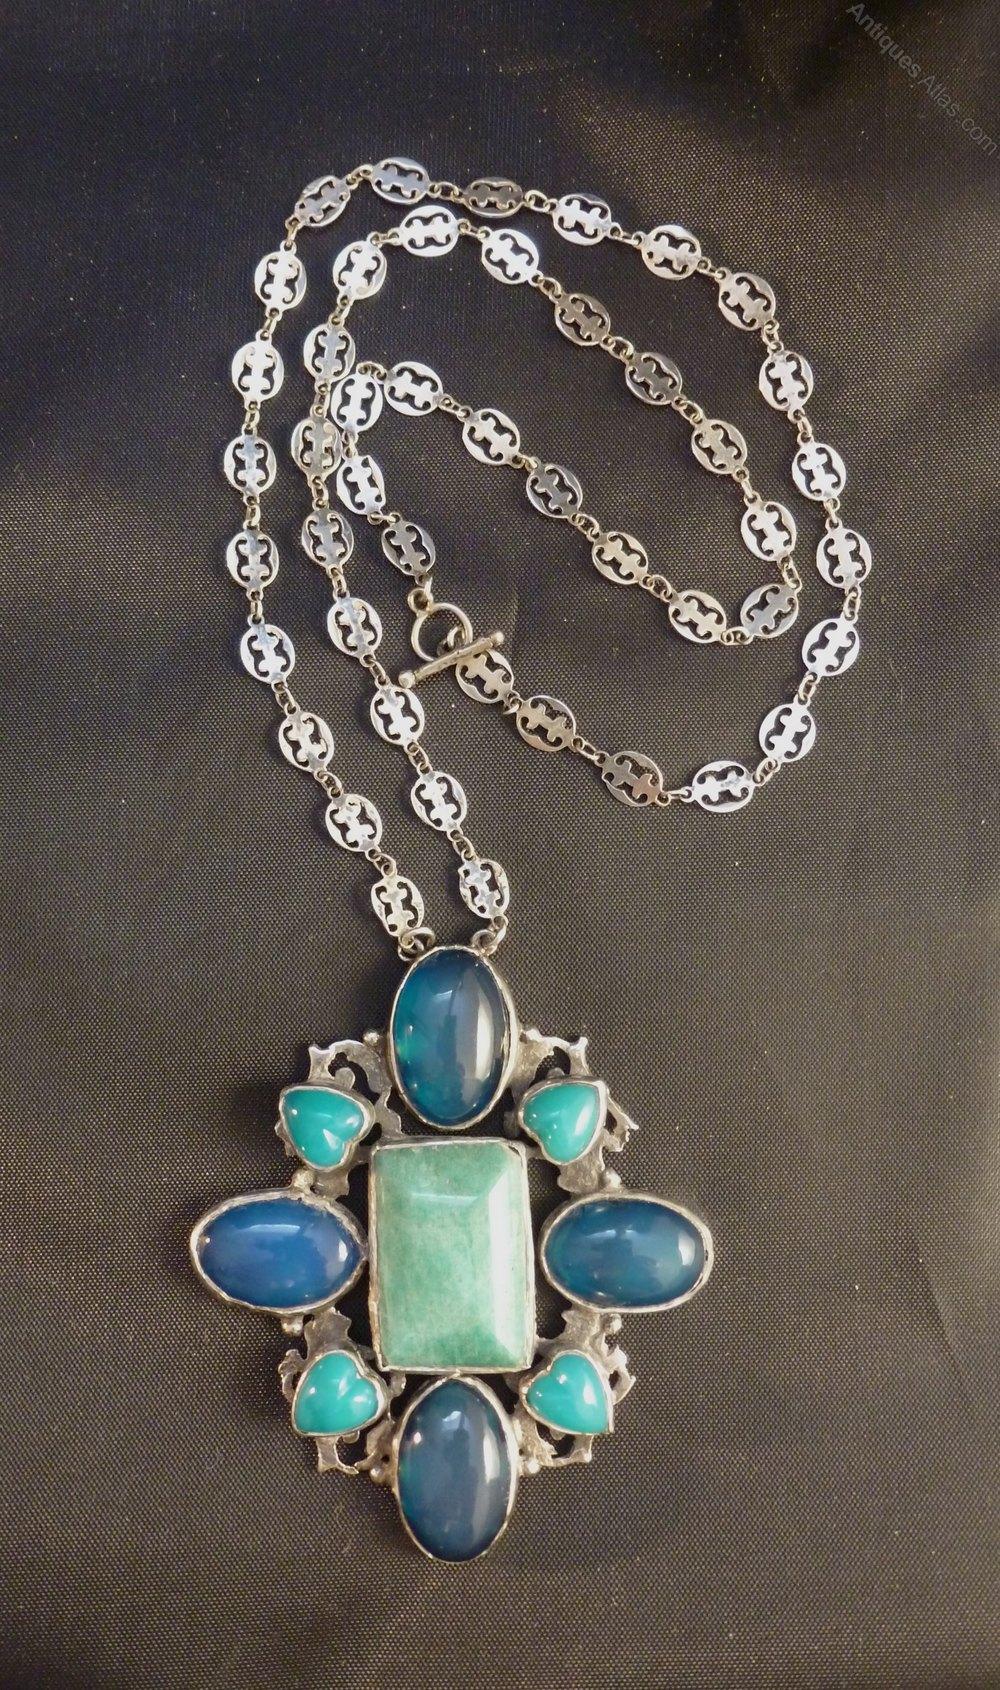 Antiques Atlas Amy Sandheim Arts And Crafts Cabochon Necklace